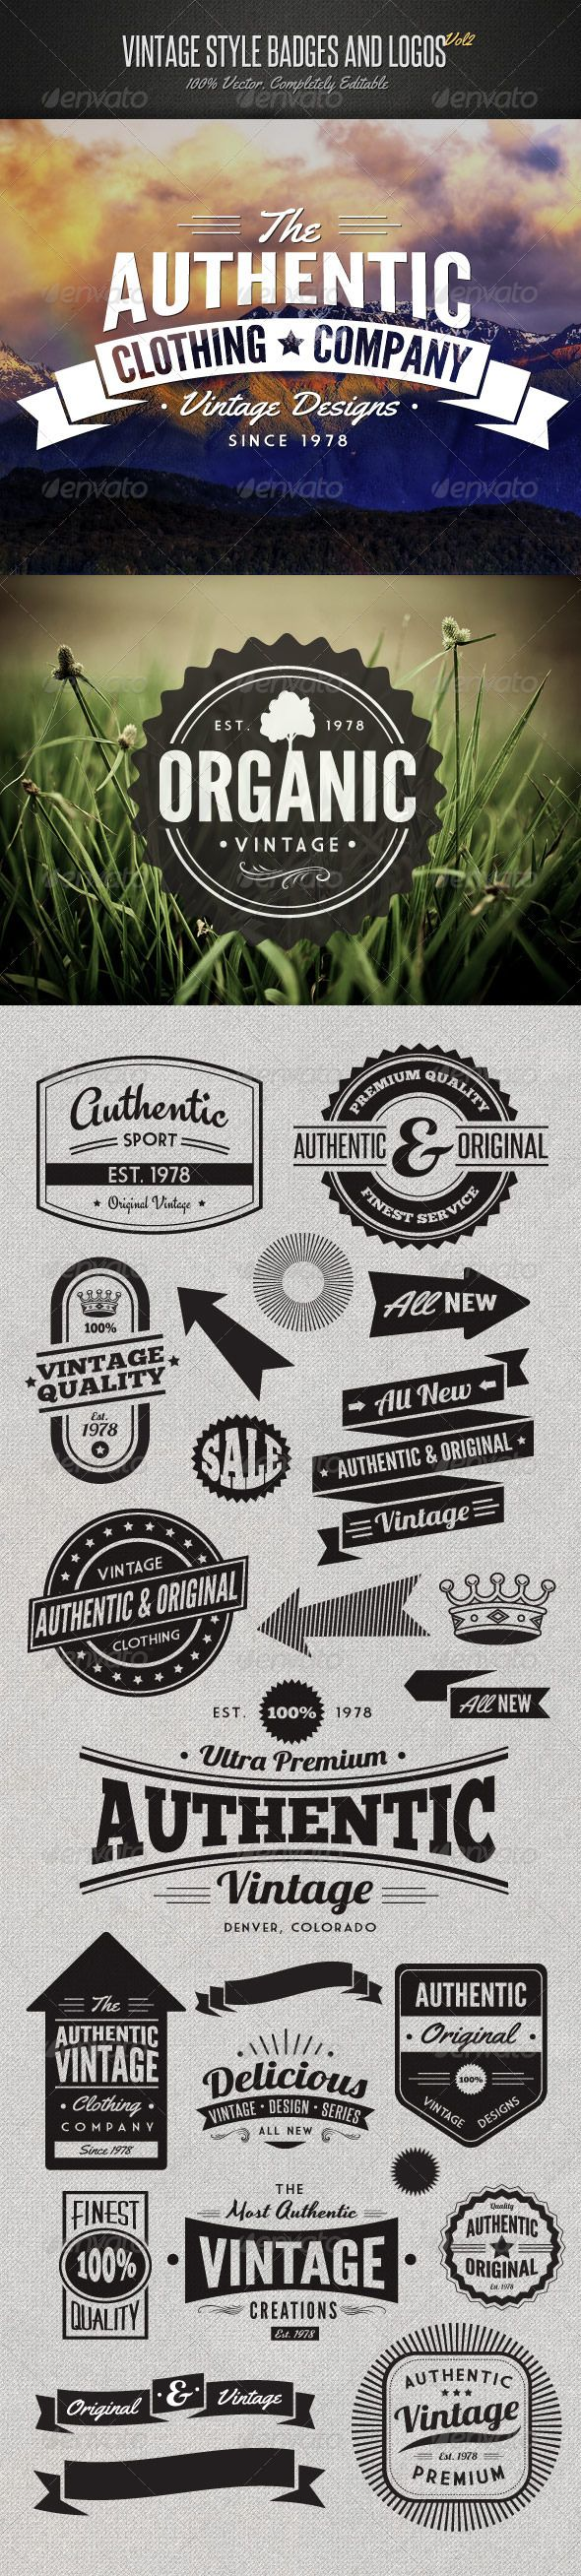 Vintage_Style_Badges_